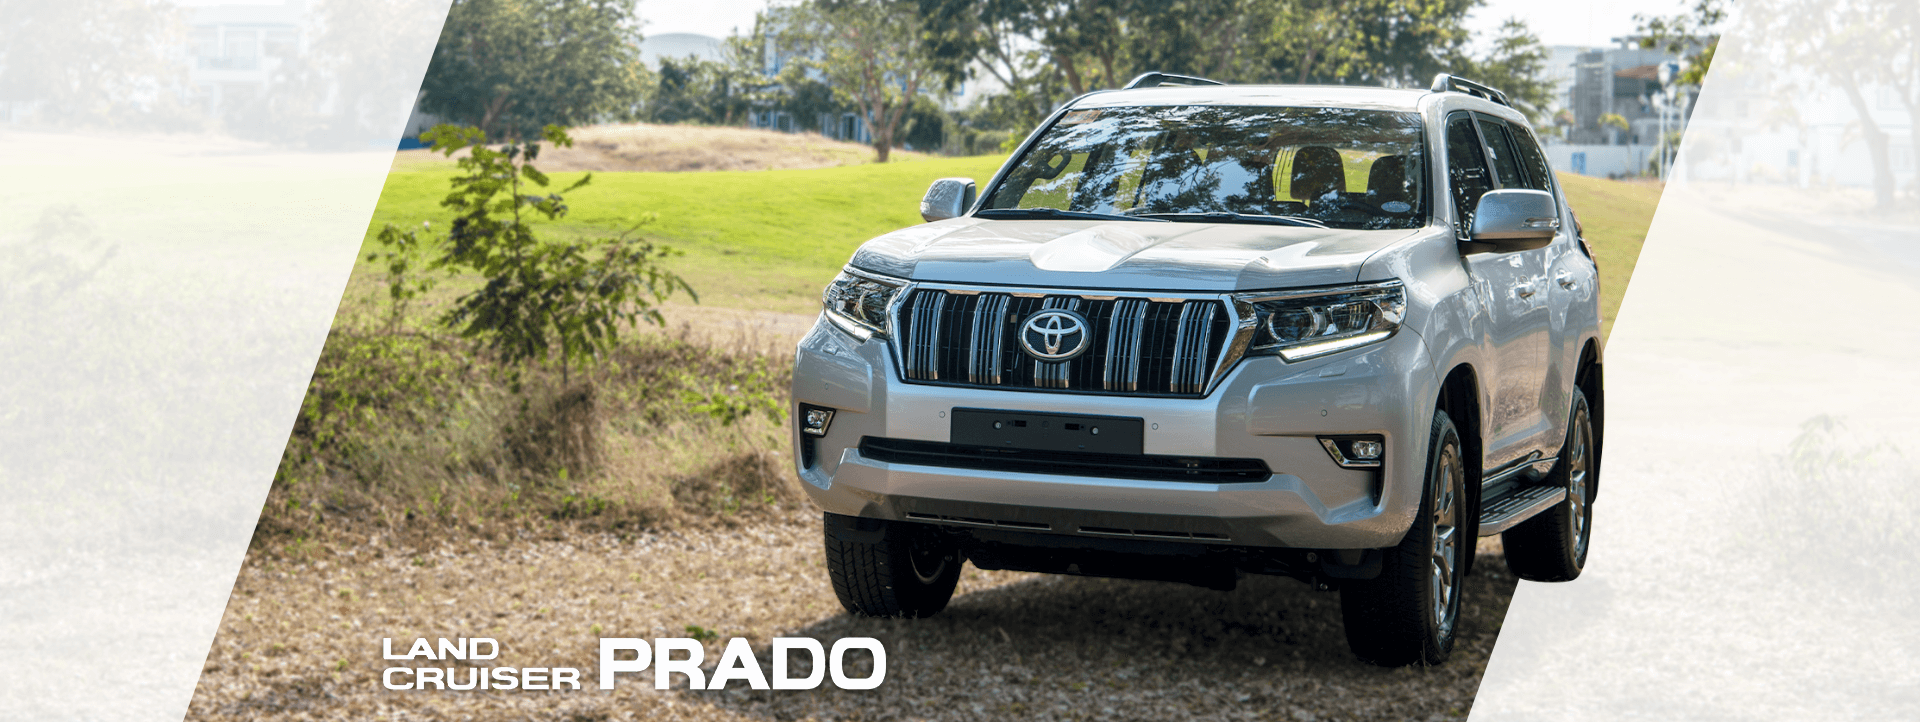 Land Cruiser Prado Desktop Banner